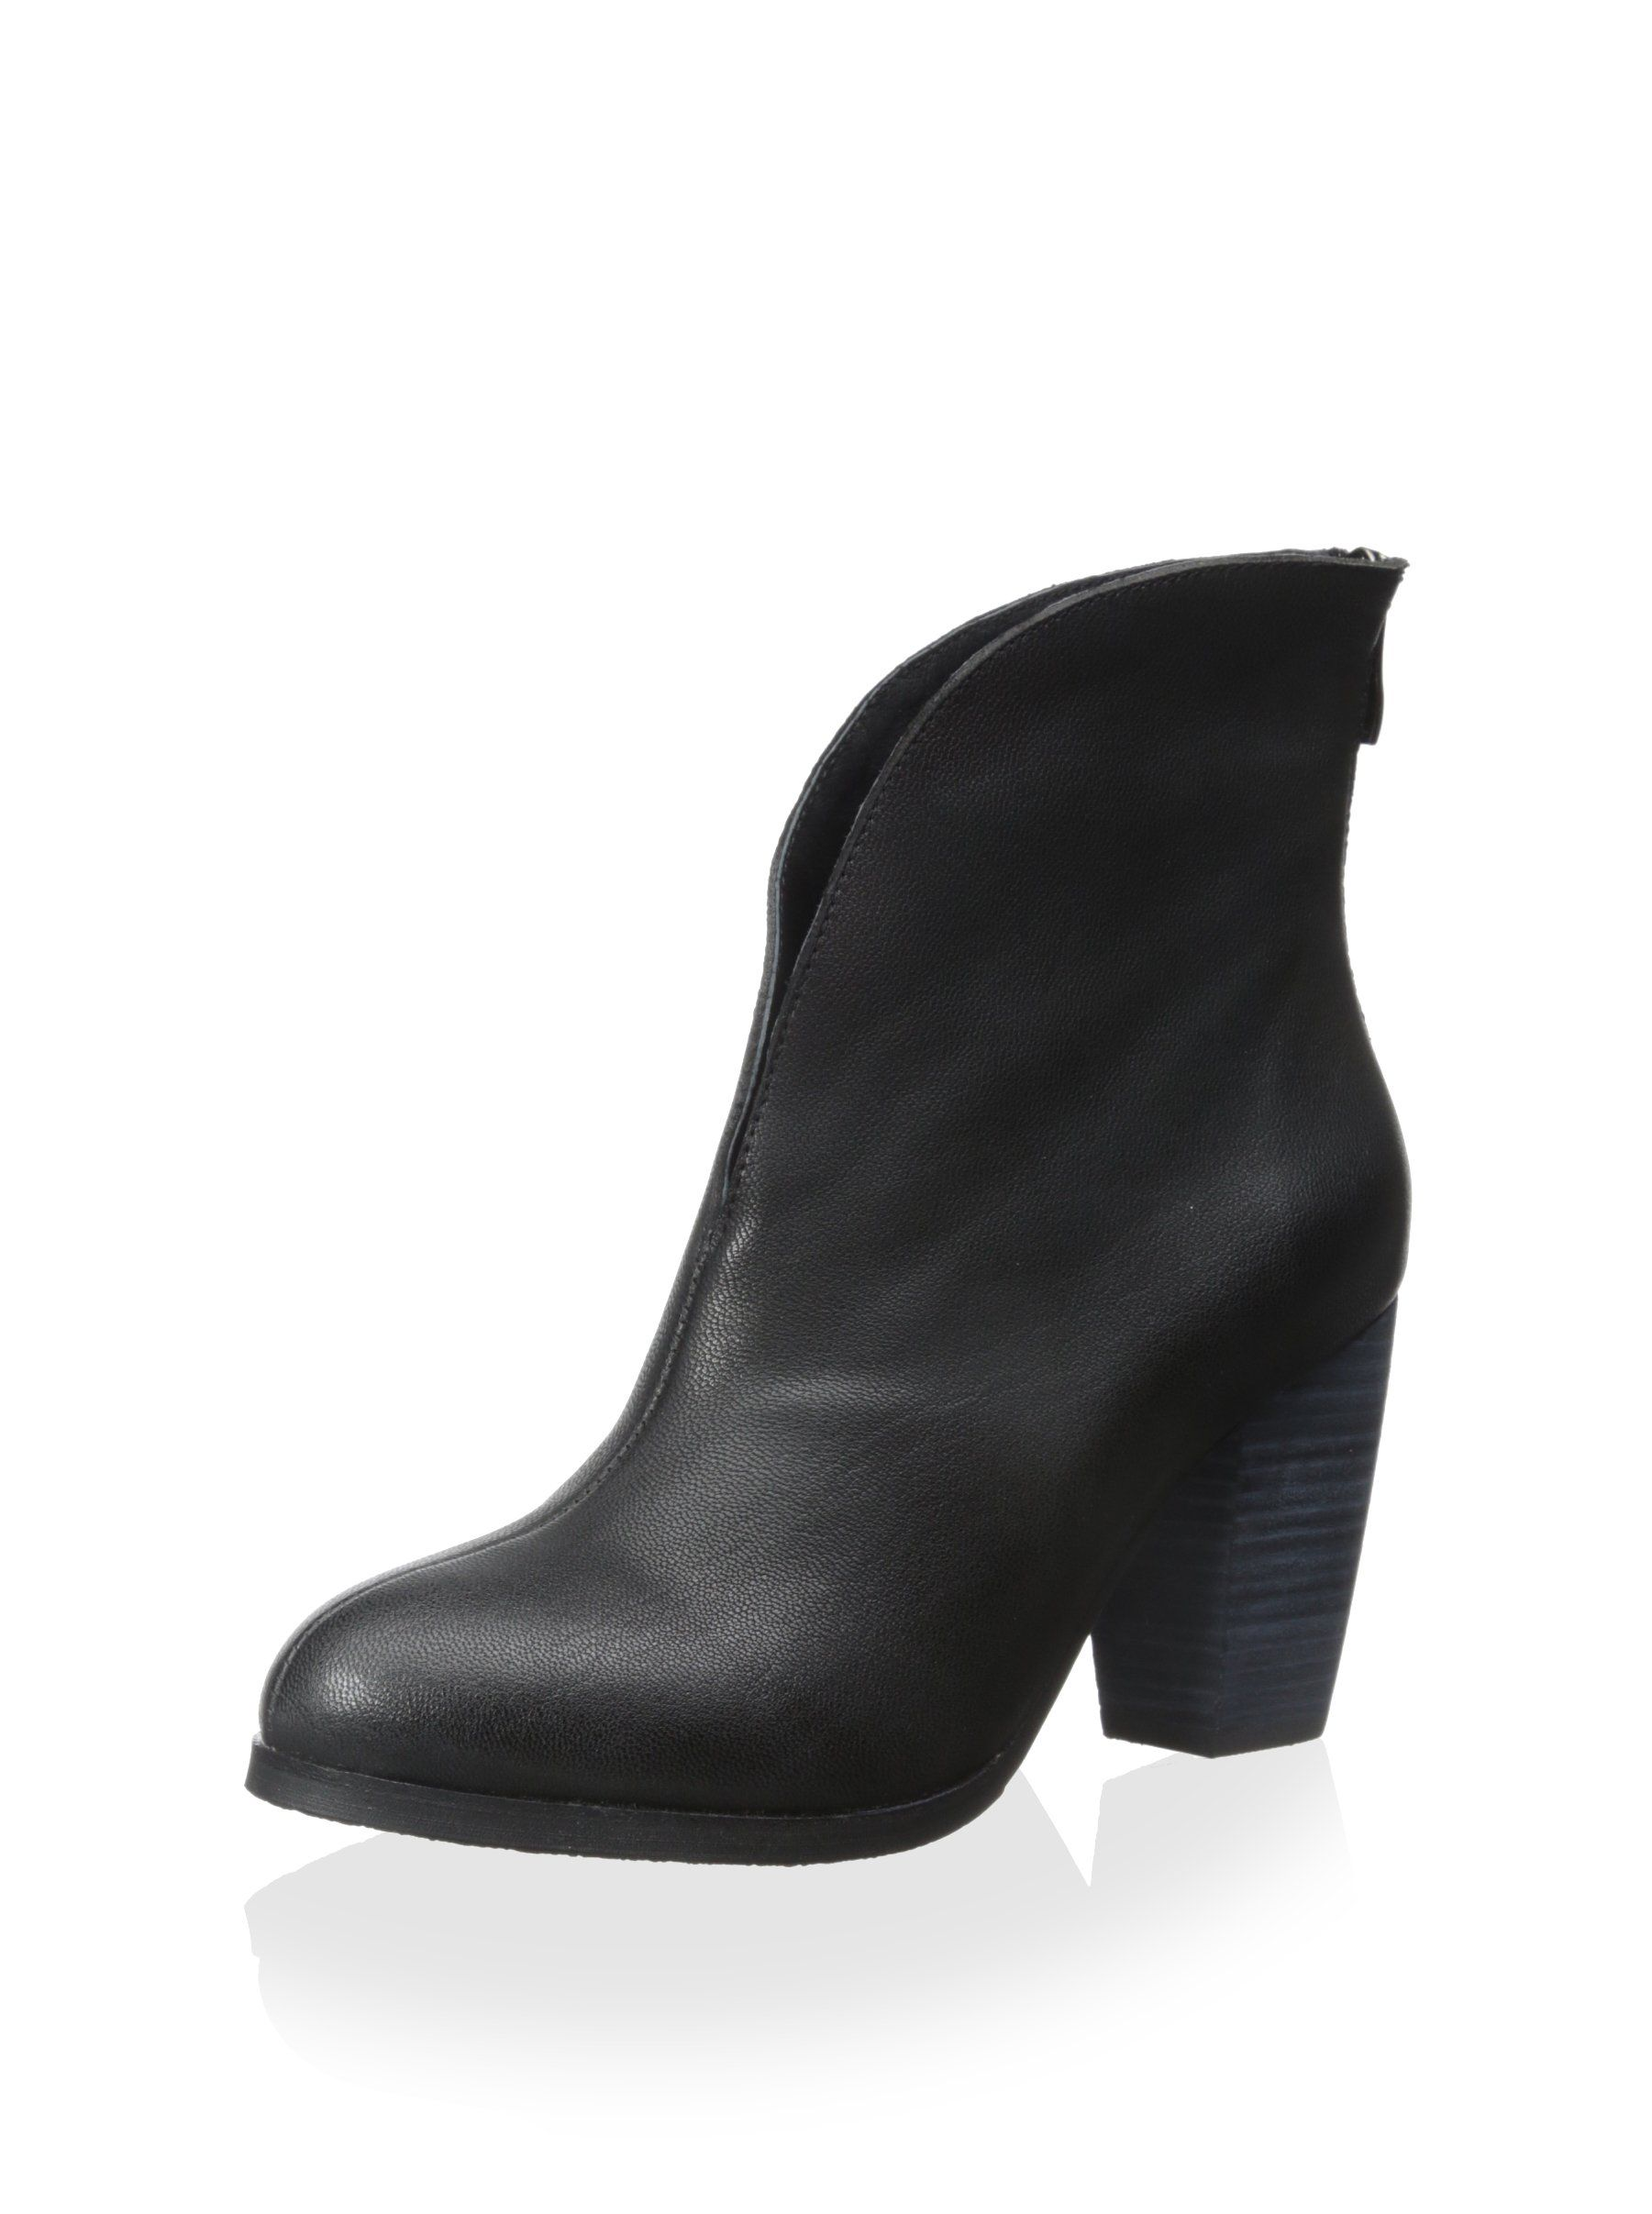 d1e71691b22d Antelope Women s Open Front Ankle Boot at MYHABIT